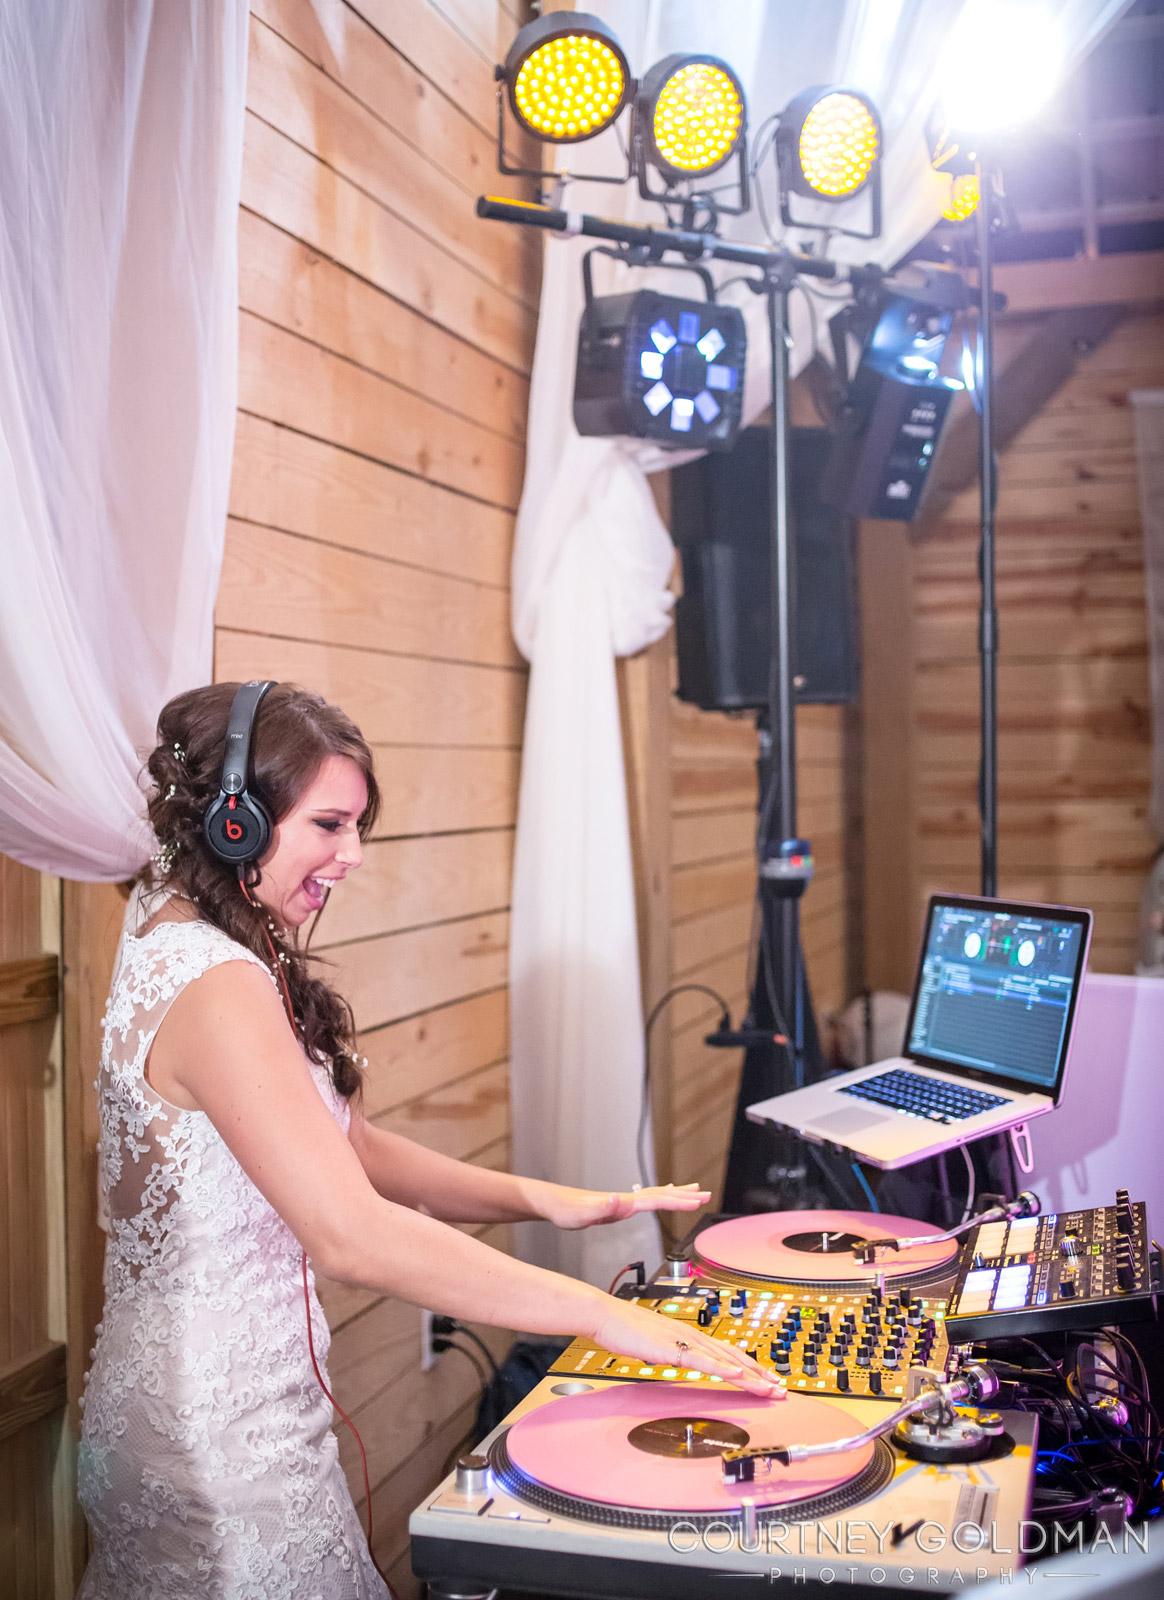 Atlanta-Wedding-Photography-by-Courtney-Goldman-68.jpg